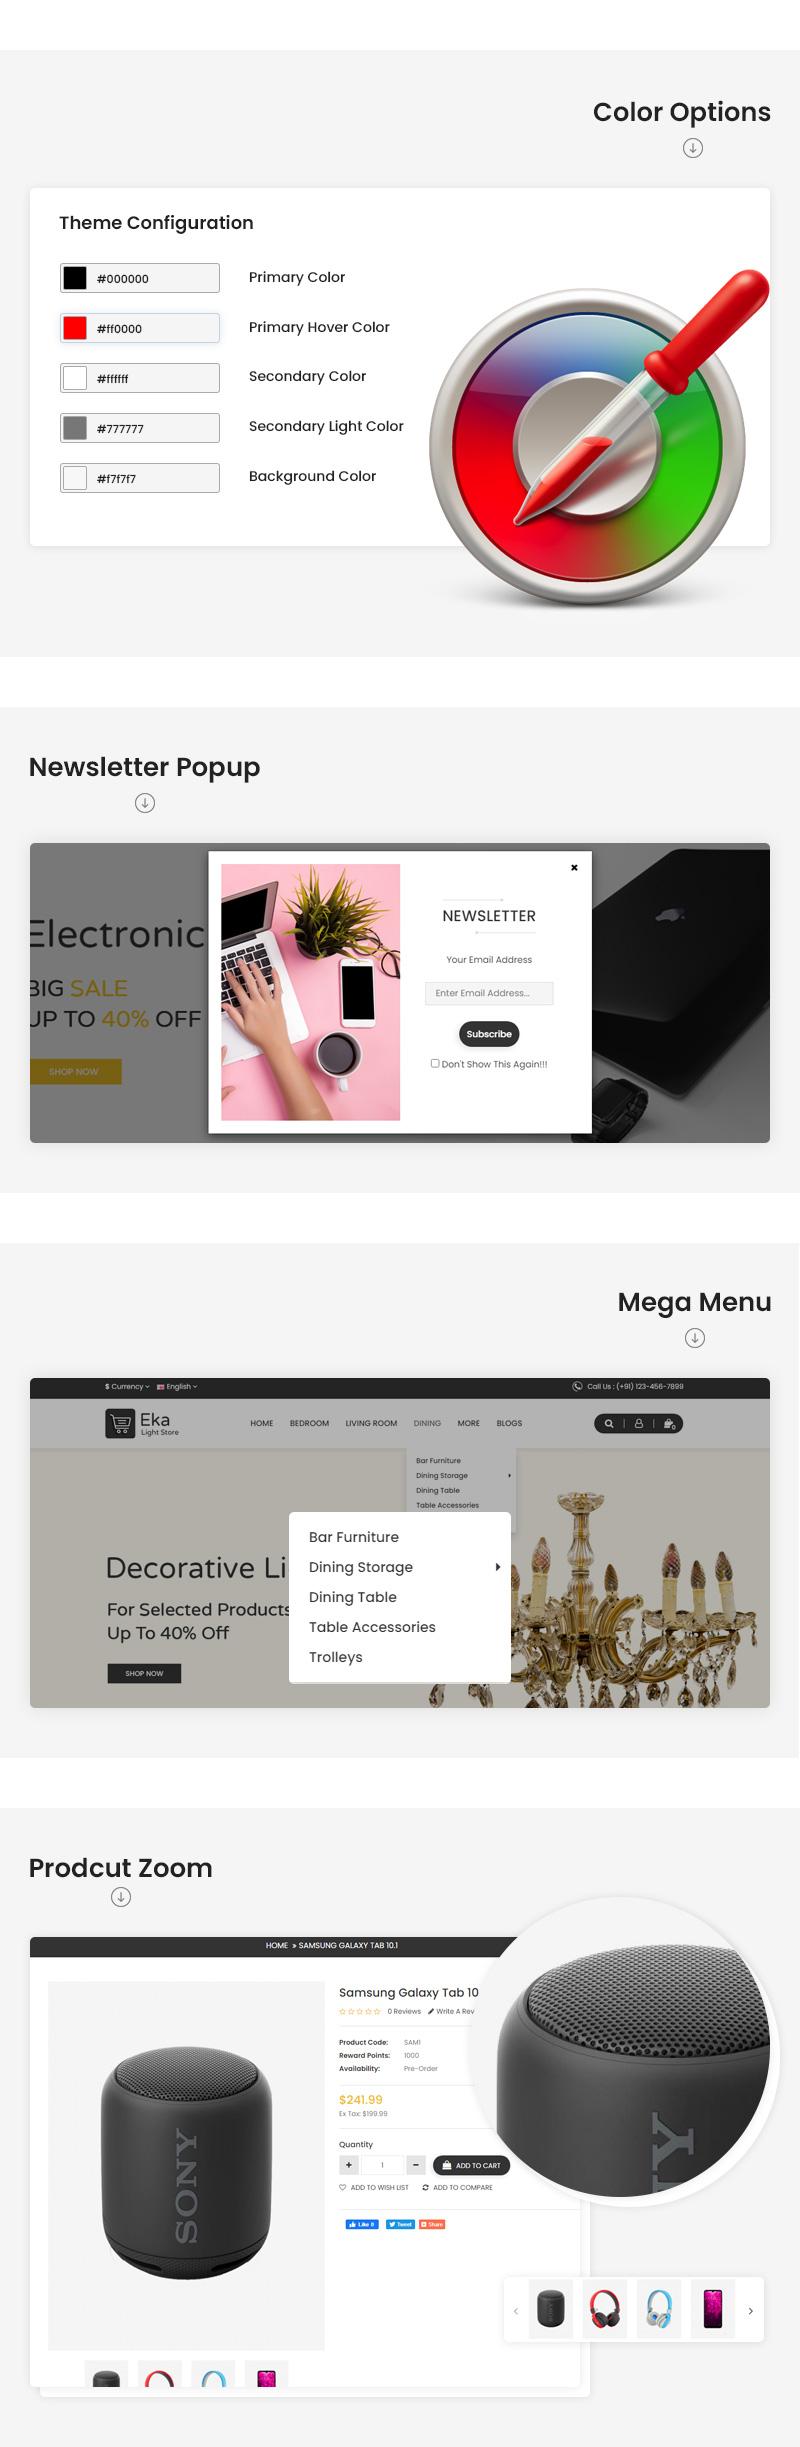 eka-features-3.jpg